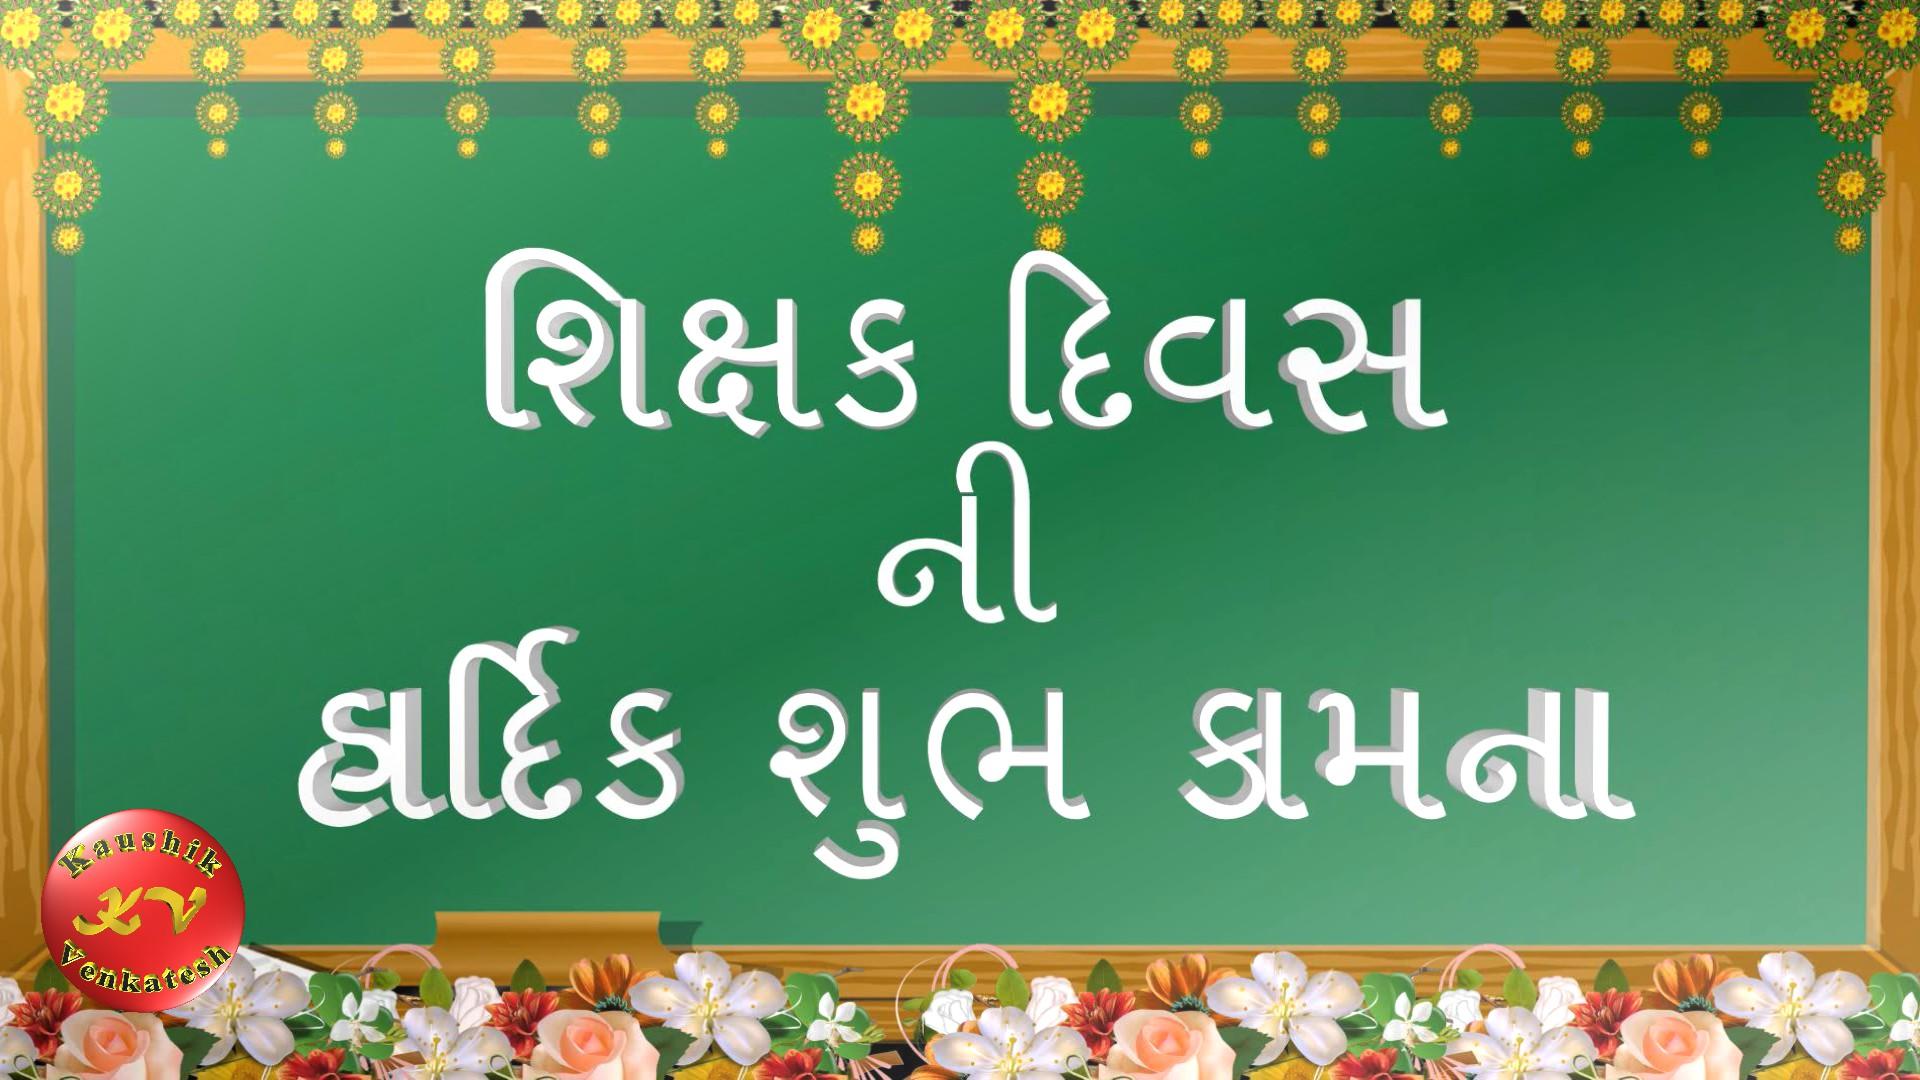 Greetings Image for September 5th (Teacher's Day) in Gujarati